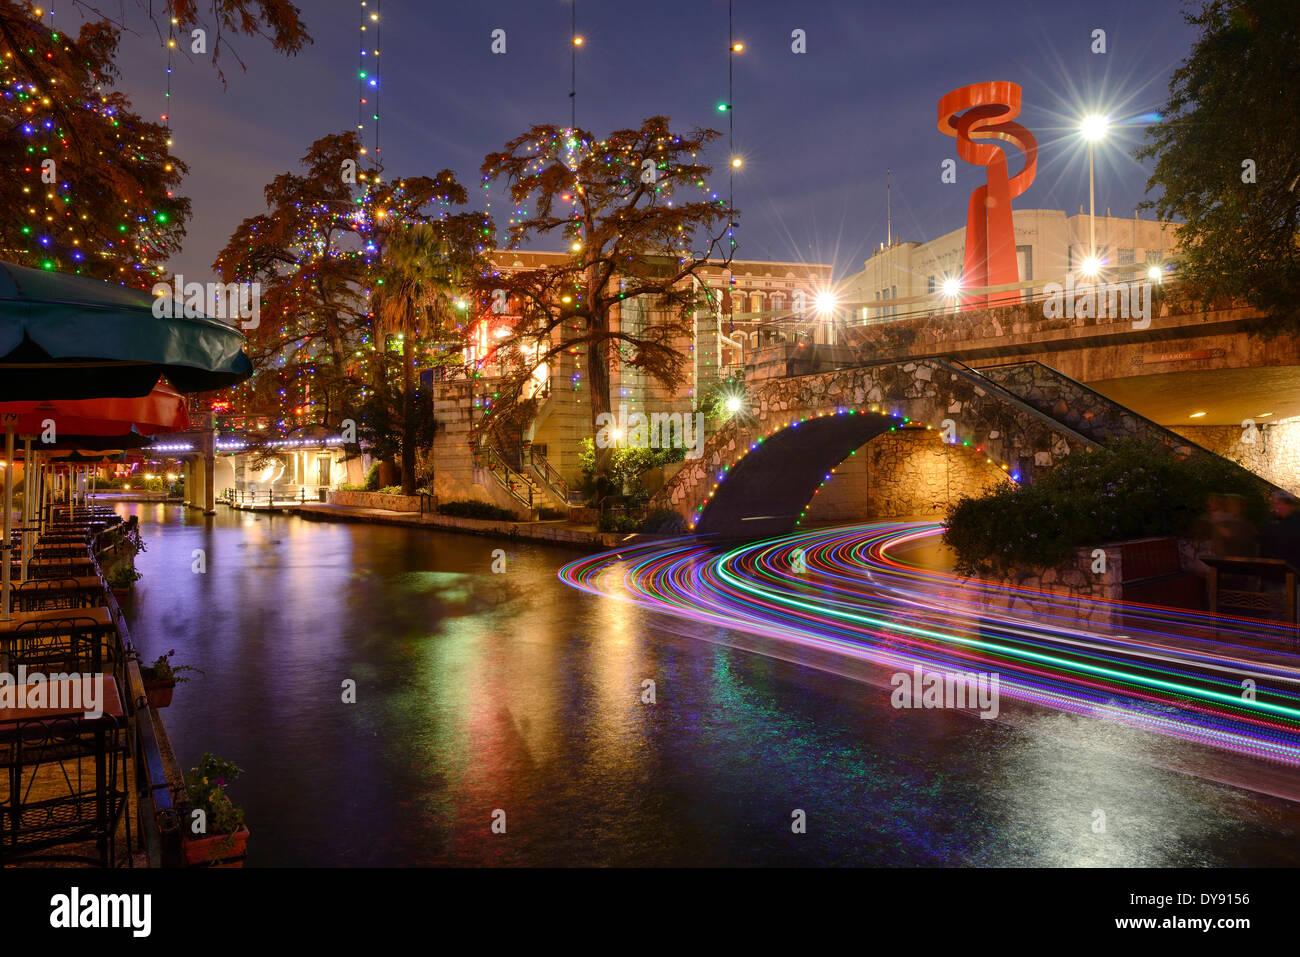 USA, United States, America, Texas, San Antonio, River Walk, dusk, river, city, evening, lights - Stock Image